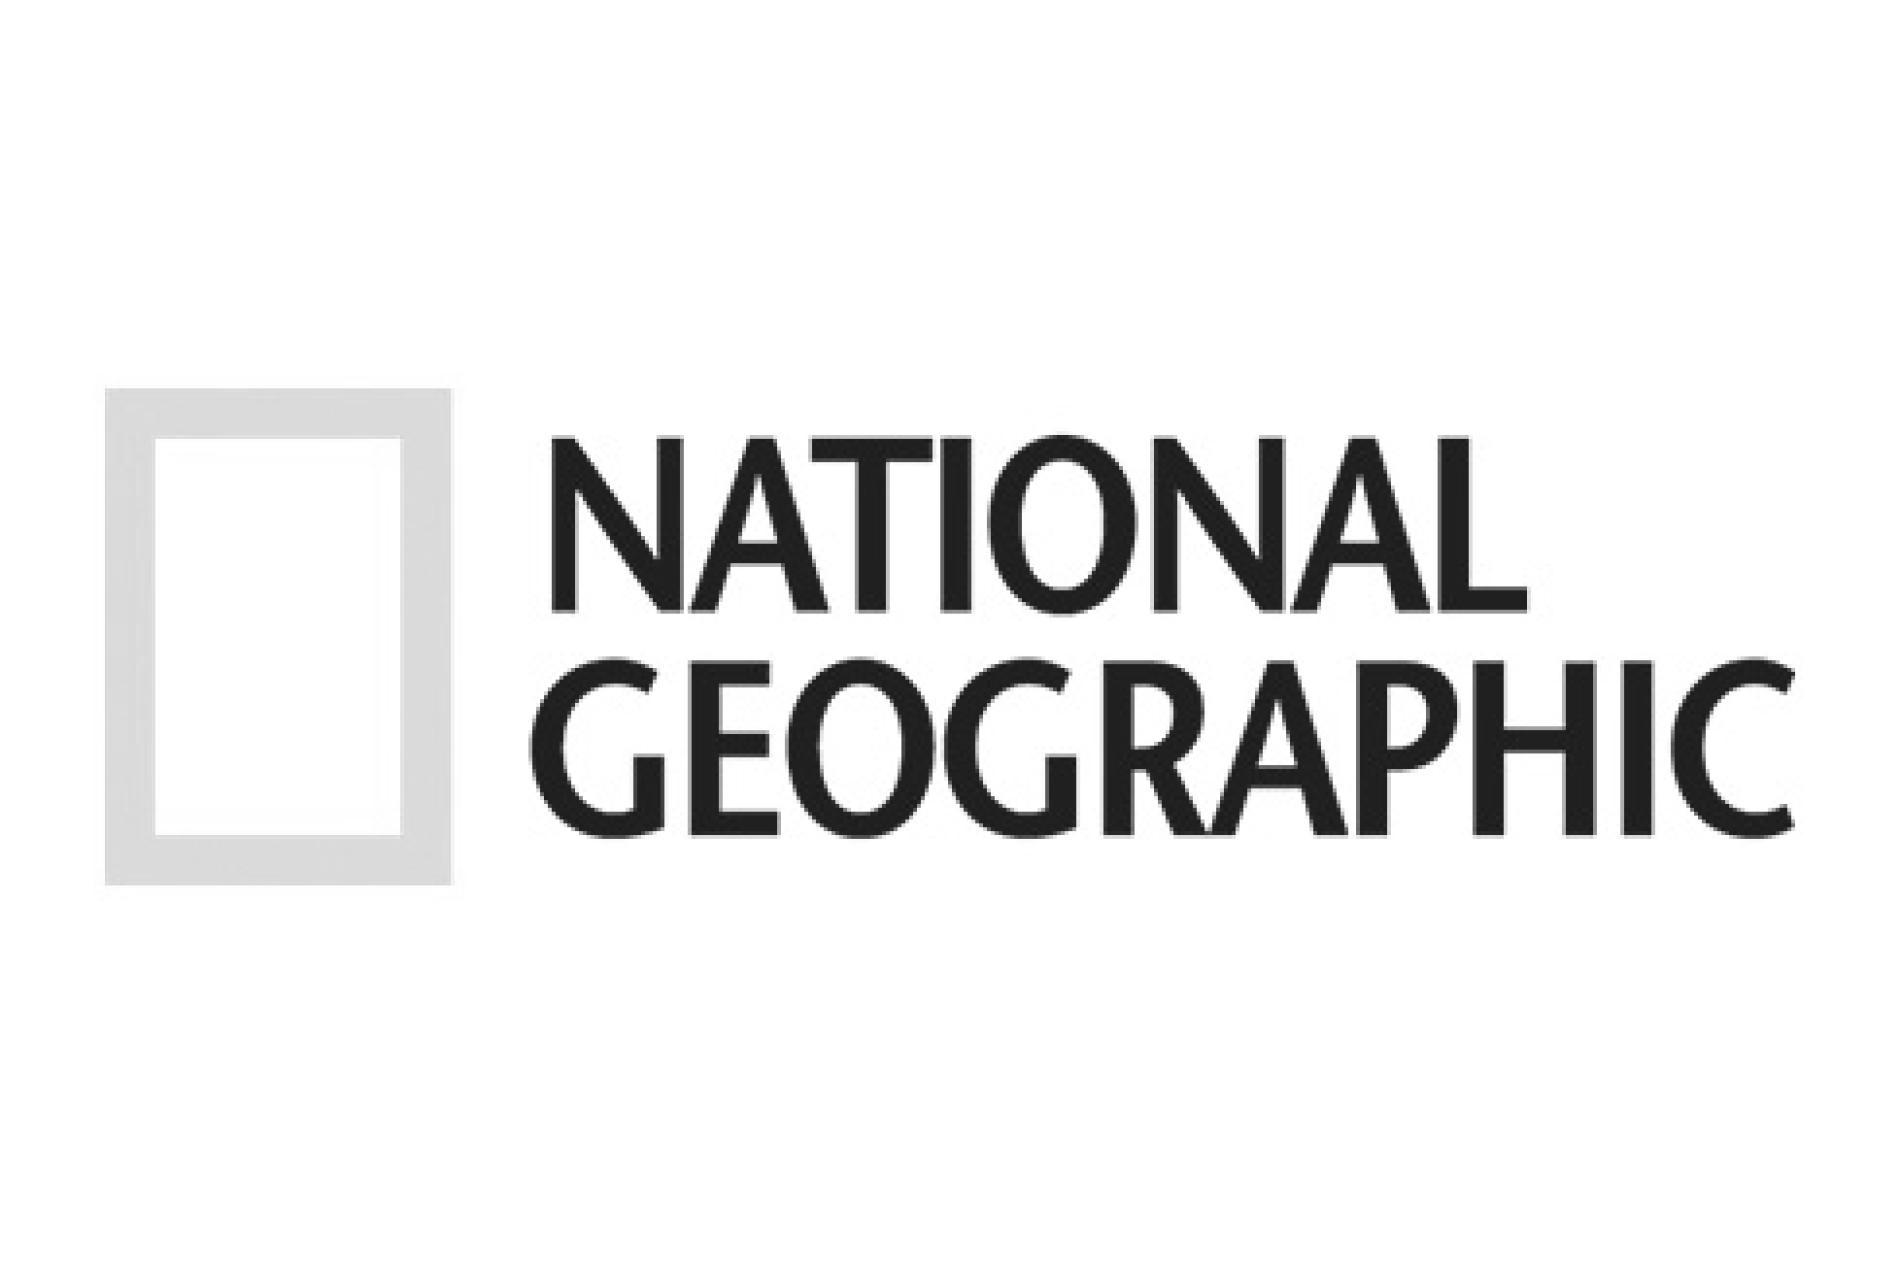 National-Geographic-Logo.ngsversion.1474040243902.adapt.1900.1.jpg